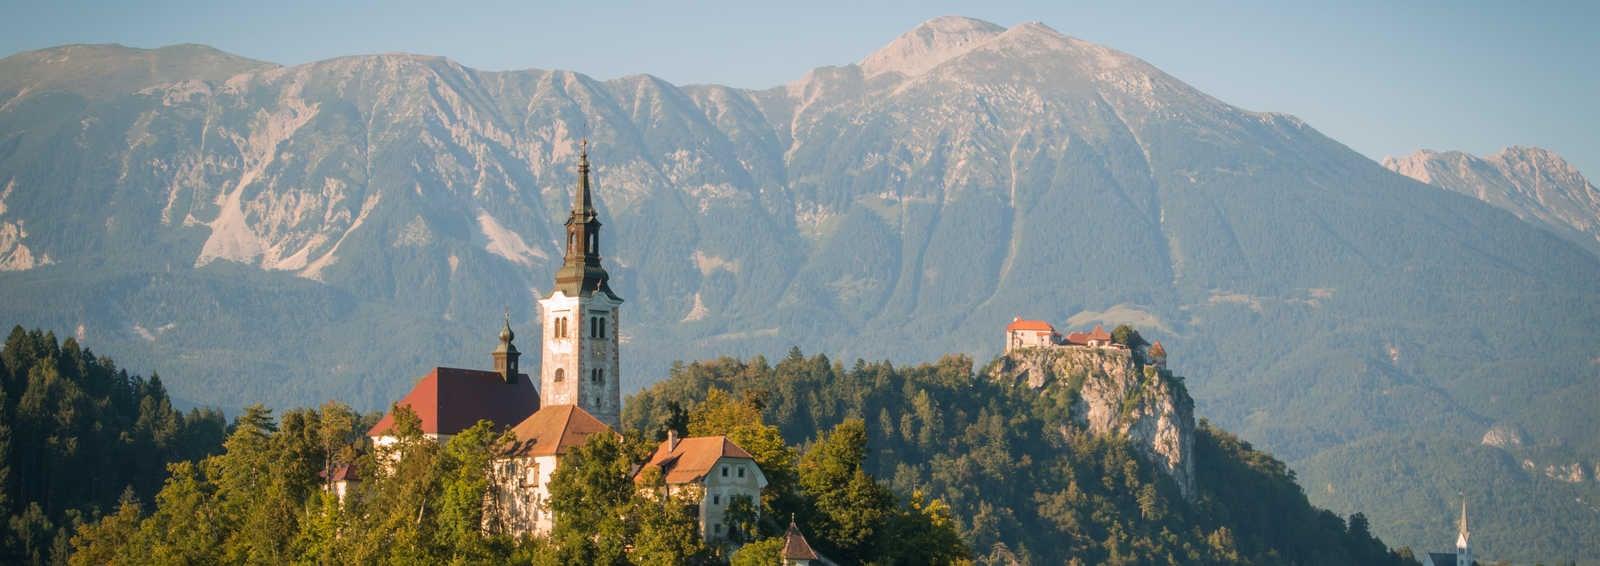 Lake Bled at dawn, Slovenia